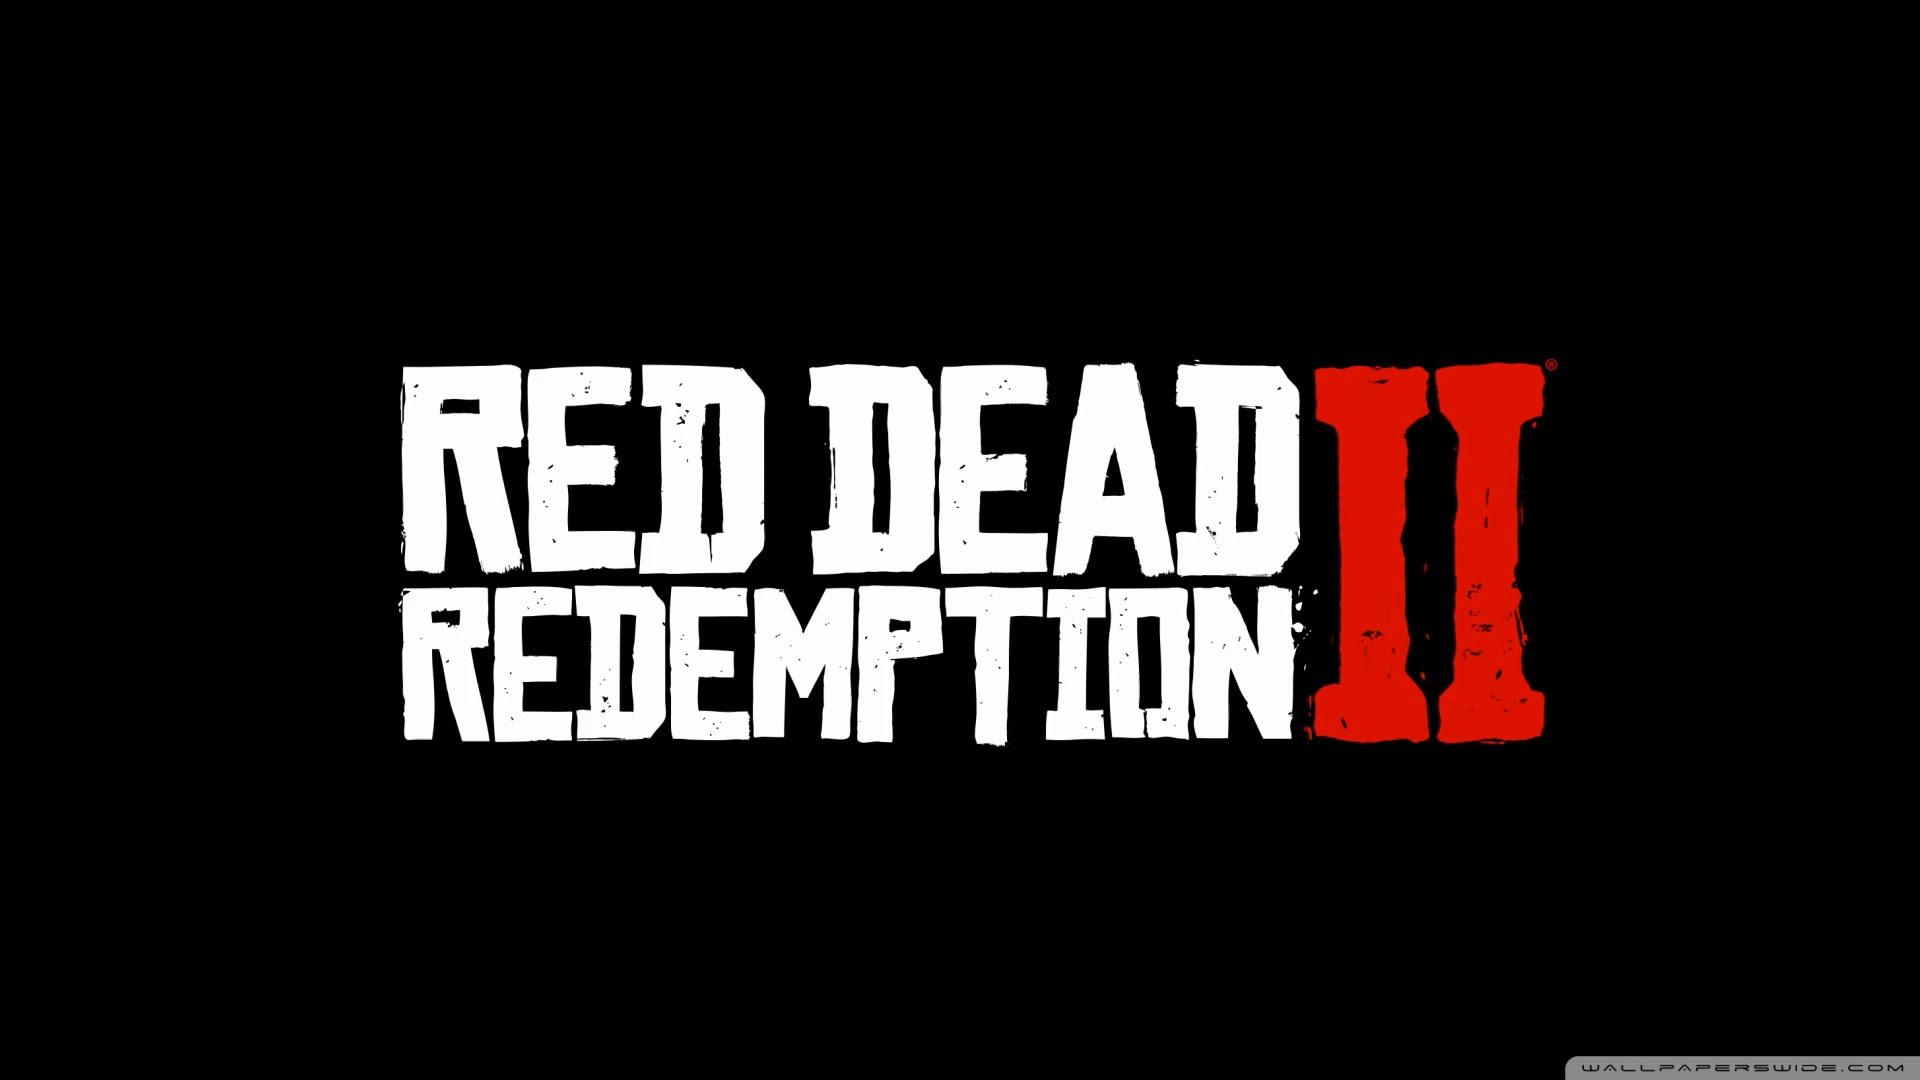 Red Dead Redemption 2 Uhd Desktop Wallpaper For 4k Ultra Hd